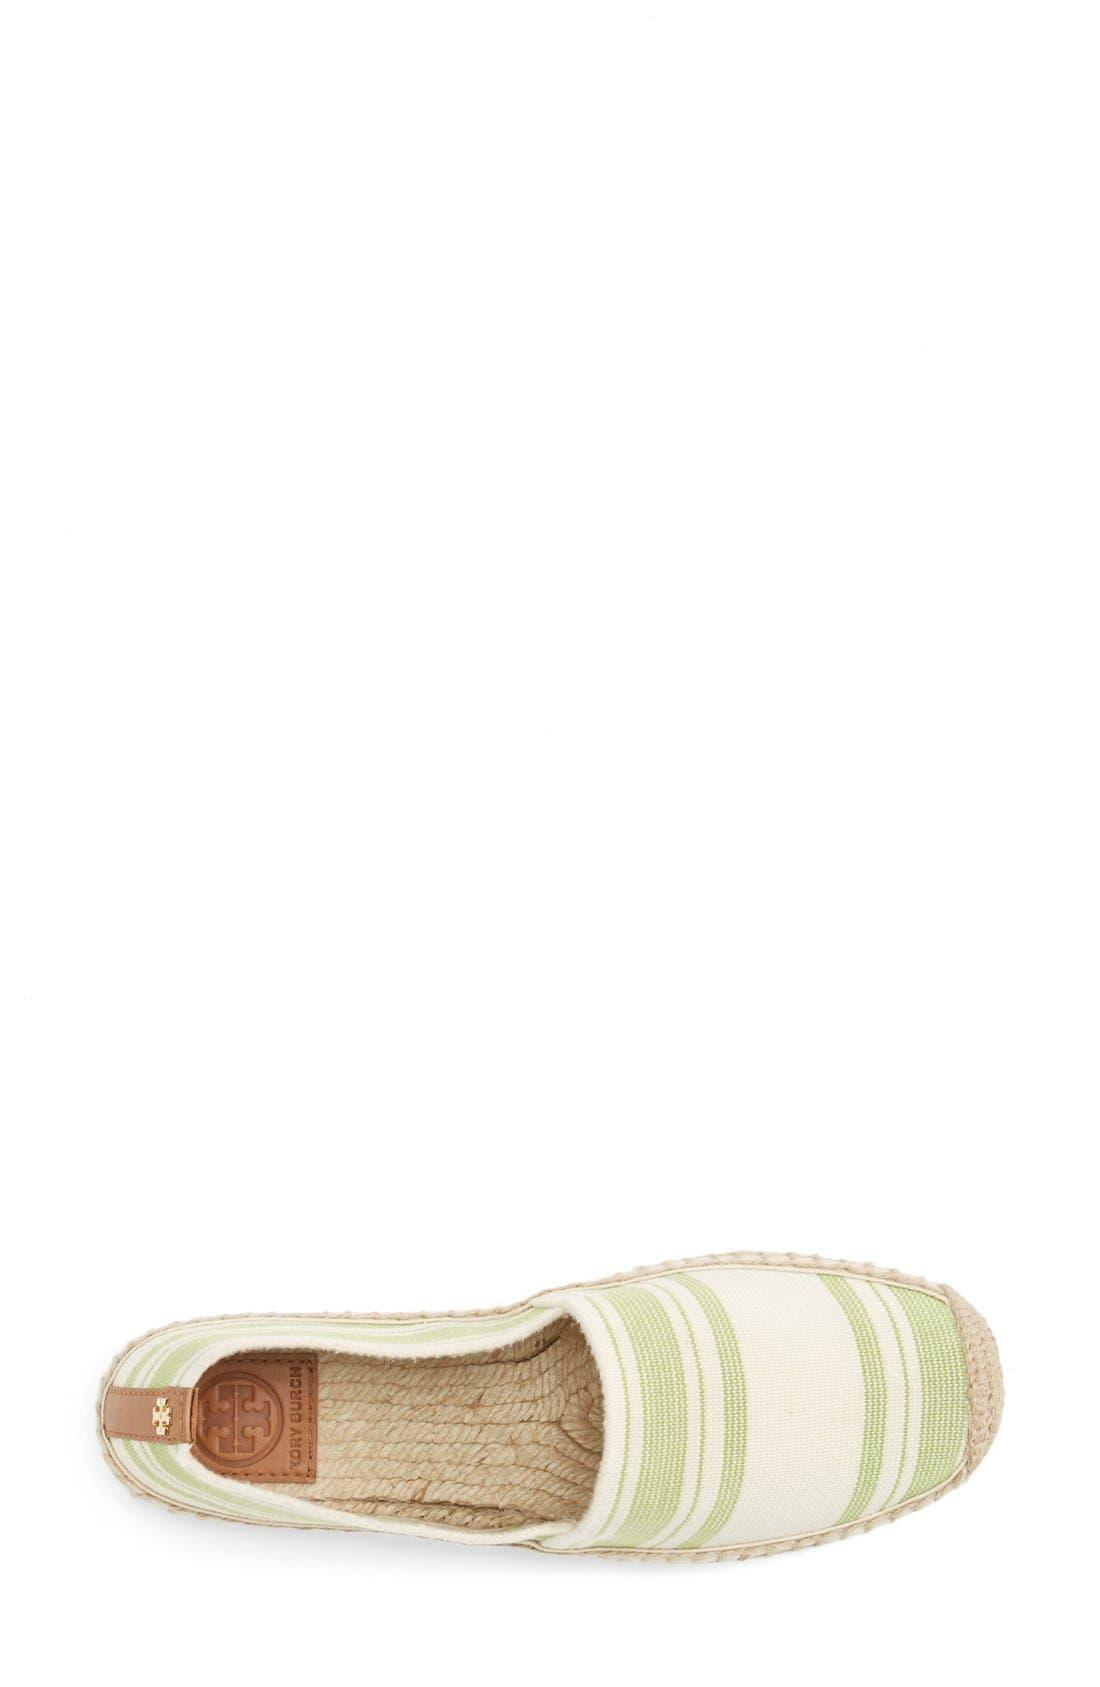 Alternate Image 3  - Tory Burch Stripe Espadrille Flat (Women)